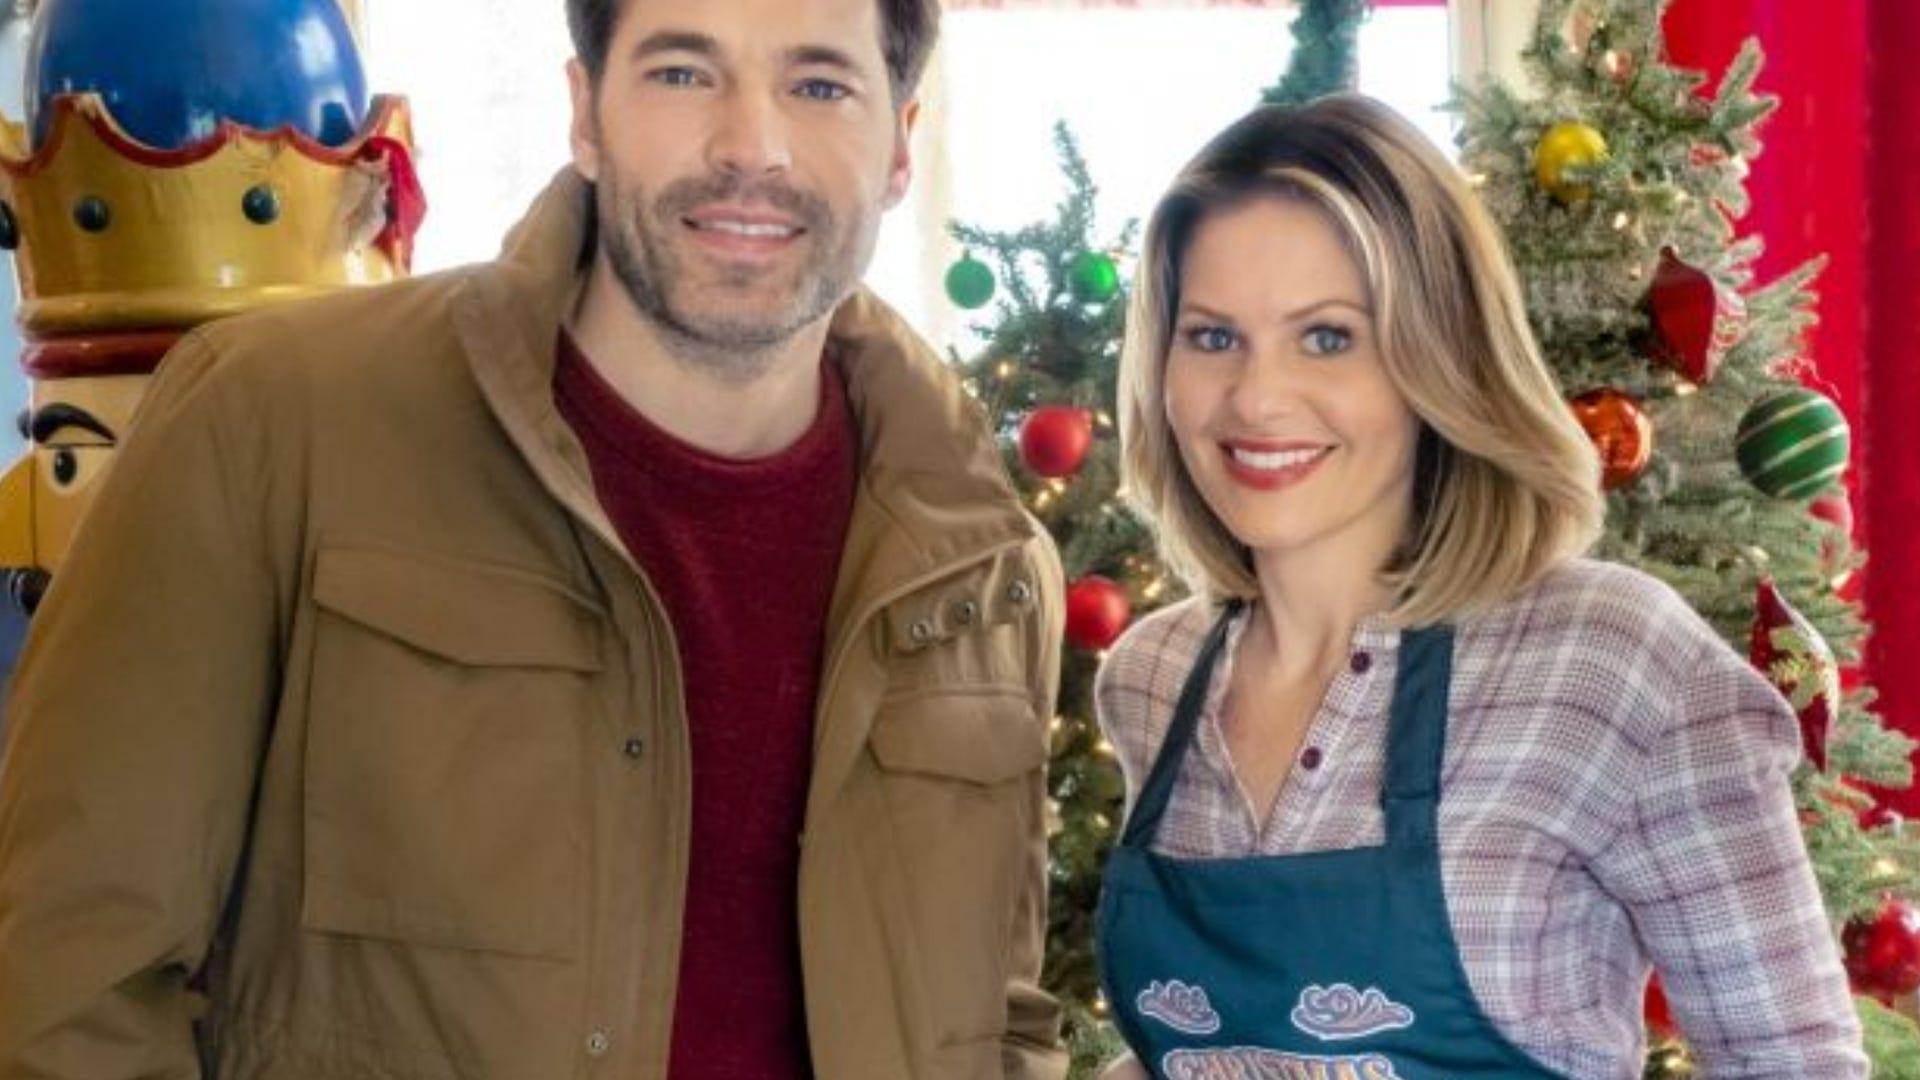 Tim Rozon and Candace Cameron Bure, Christmas Town